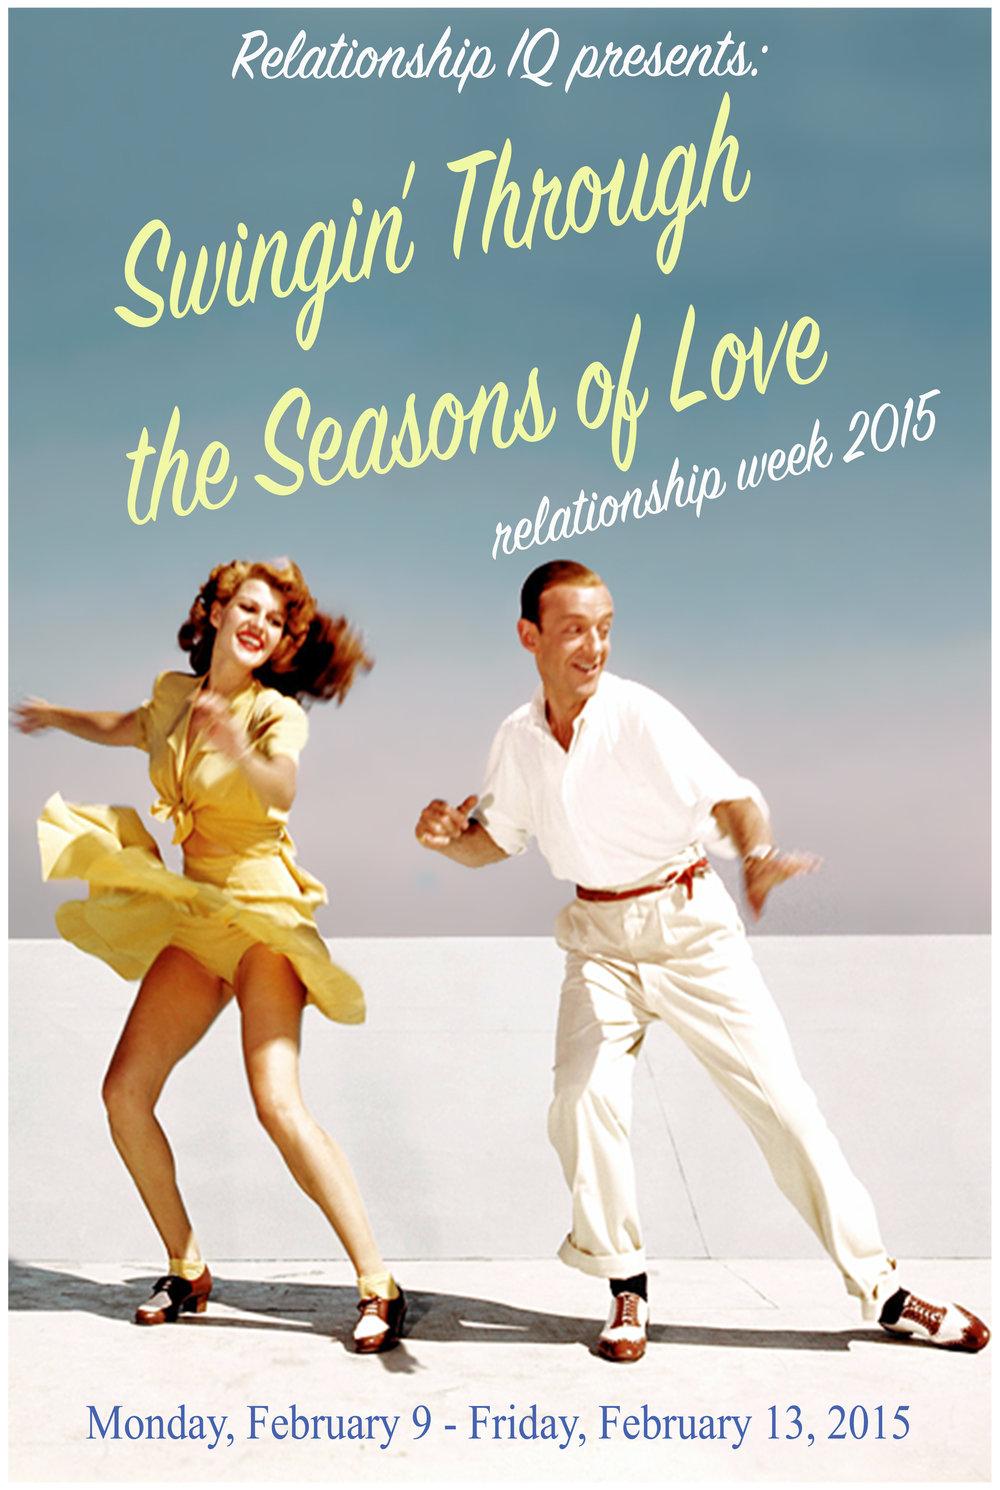 Swingin' Week Poster 12x18.jpg